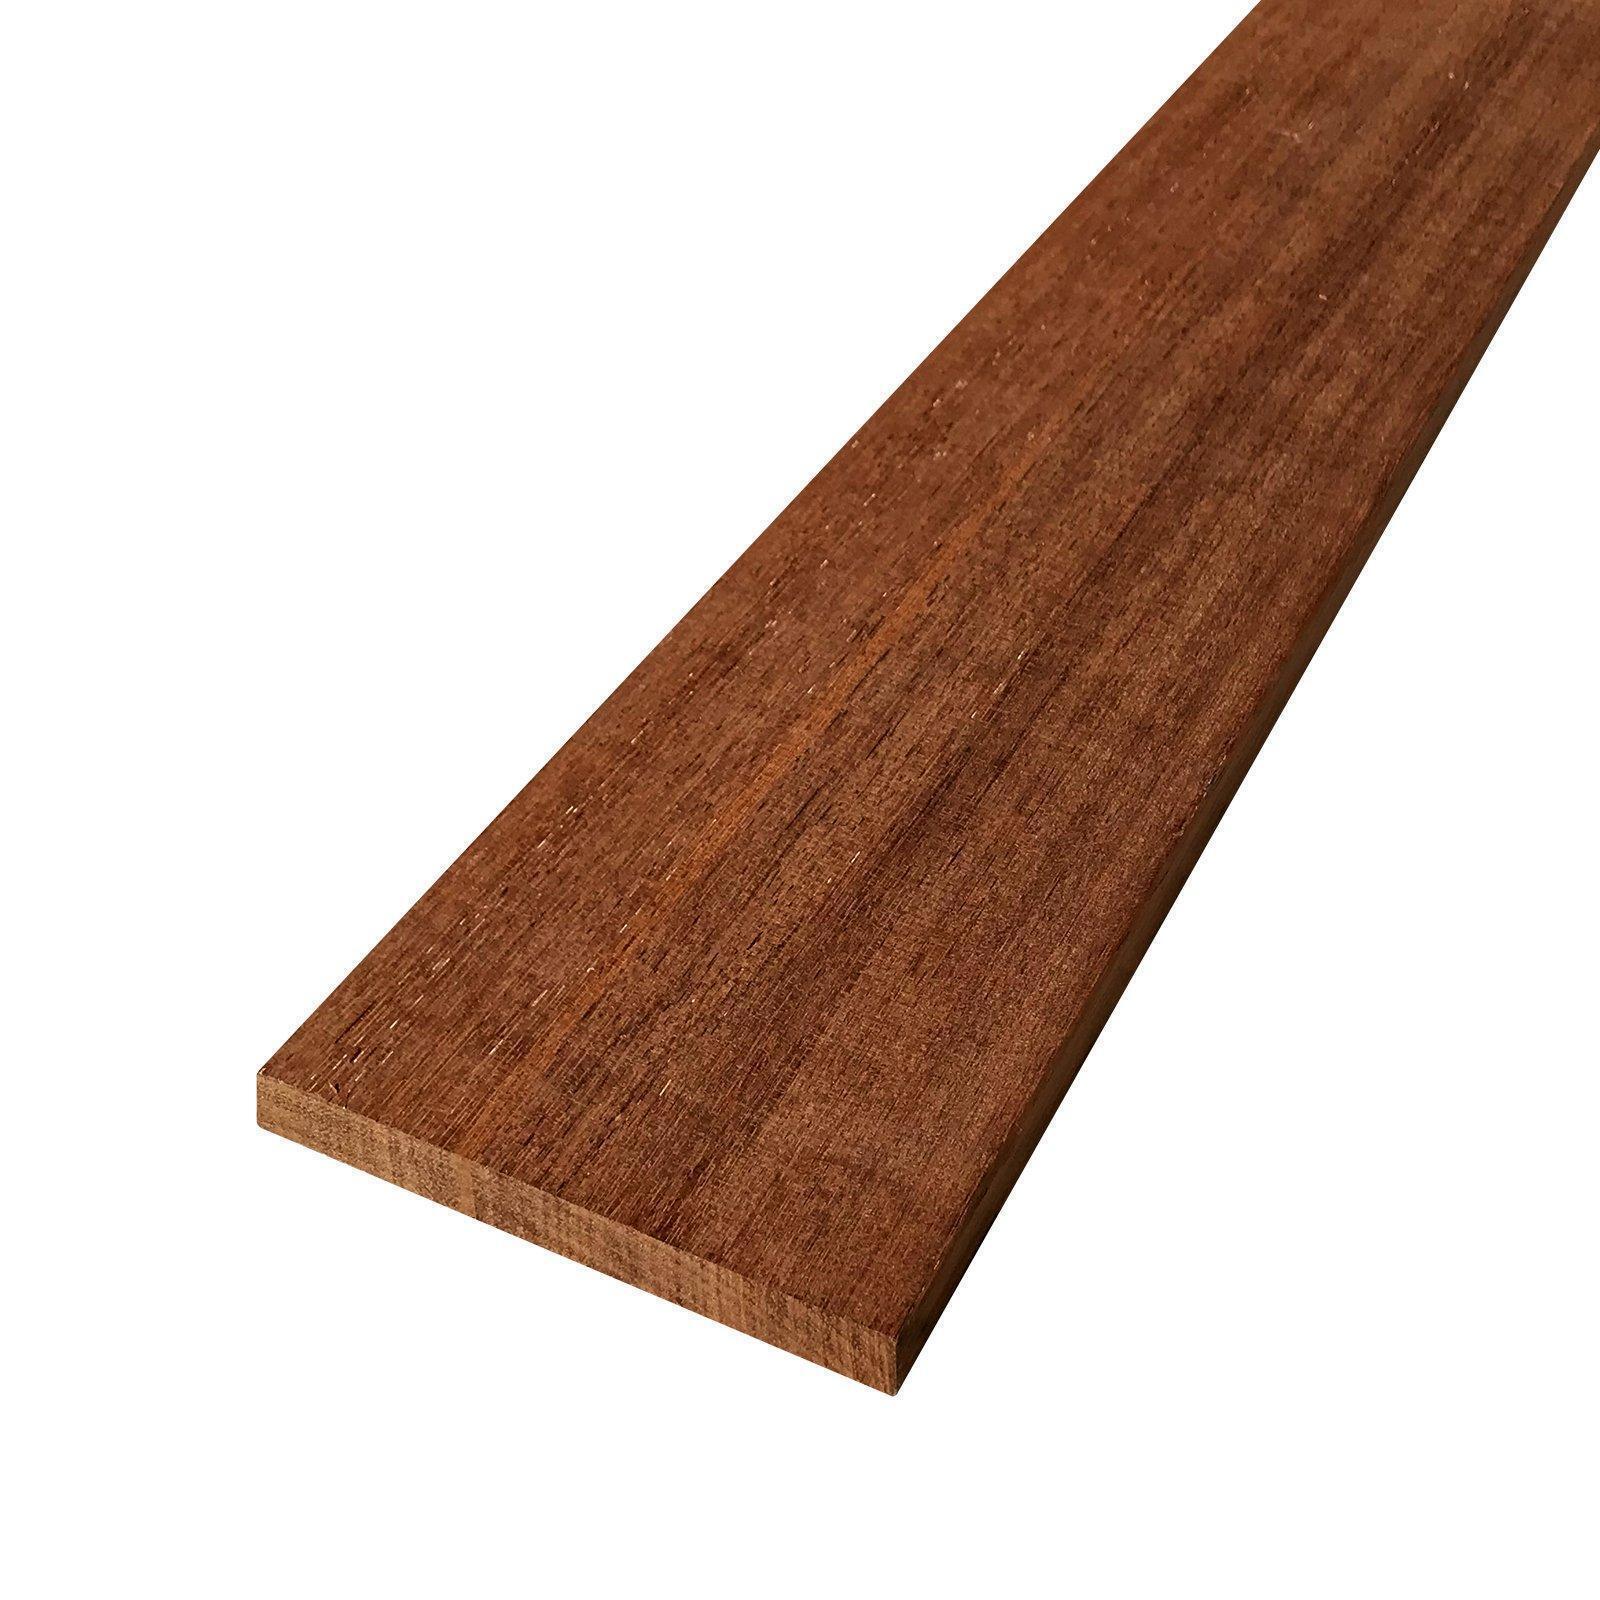 SpecRite 140 x 19mm Pre Oiled Select Grade Kwila Decking - Per Linear Metre